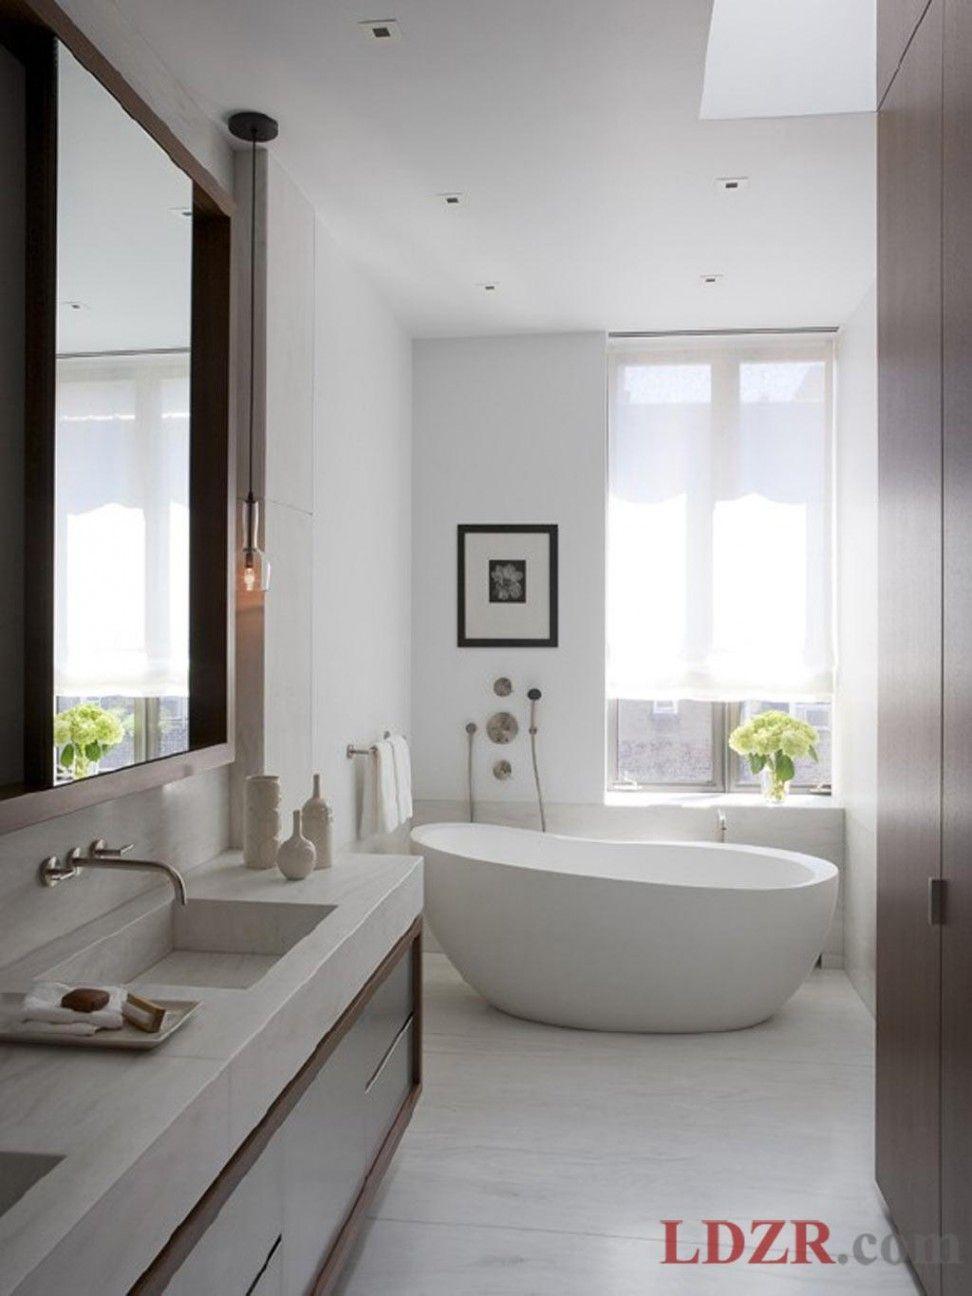 Pics Of Bathroom Design Ideas And Decorative Bathroom Vanity Wall Mirrors Exclusive Future Plan Of Beauty Bathroom Interior